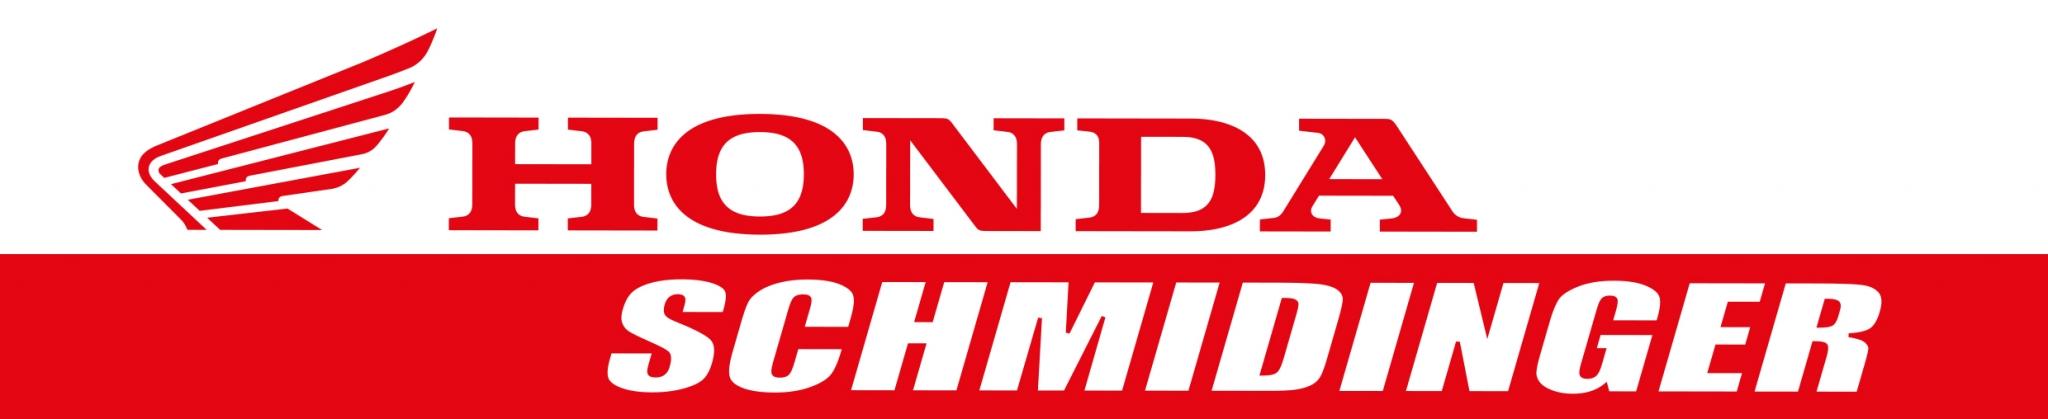 Unternehmensbilder Schmidinger Rosemarie e.U. Motorrad 12